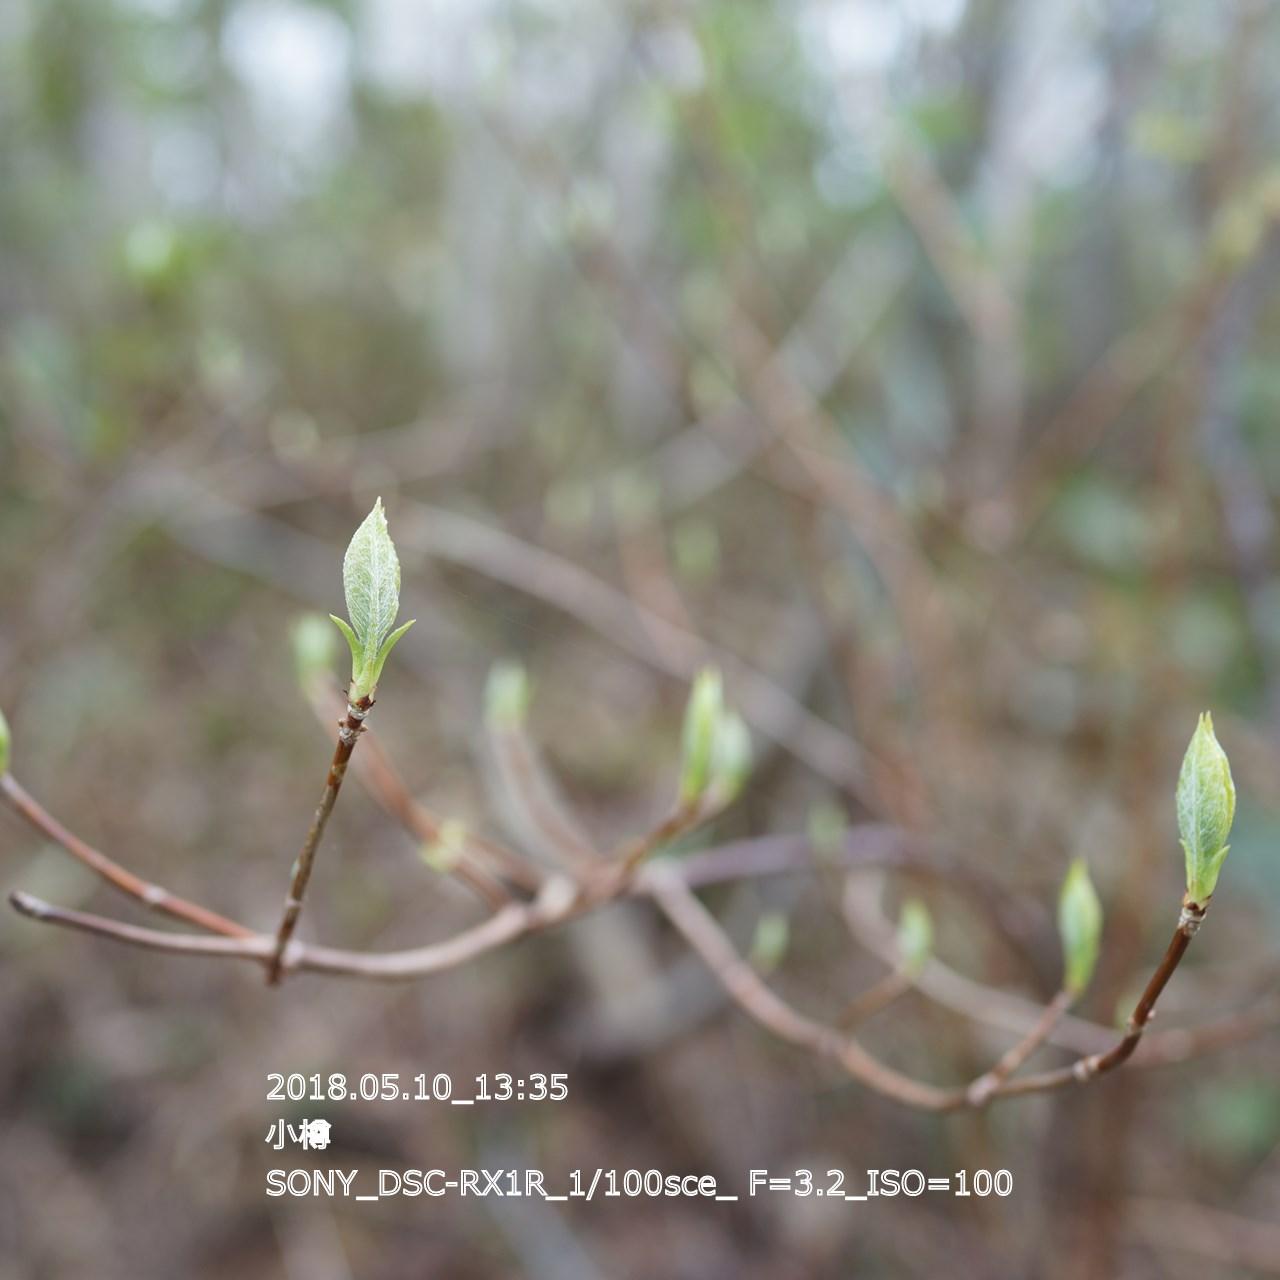 2018/05/11_06:13:44  DSC05232.jpg